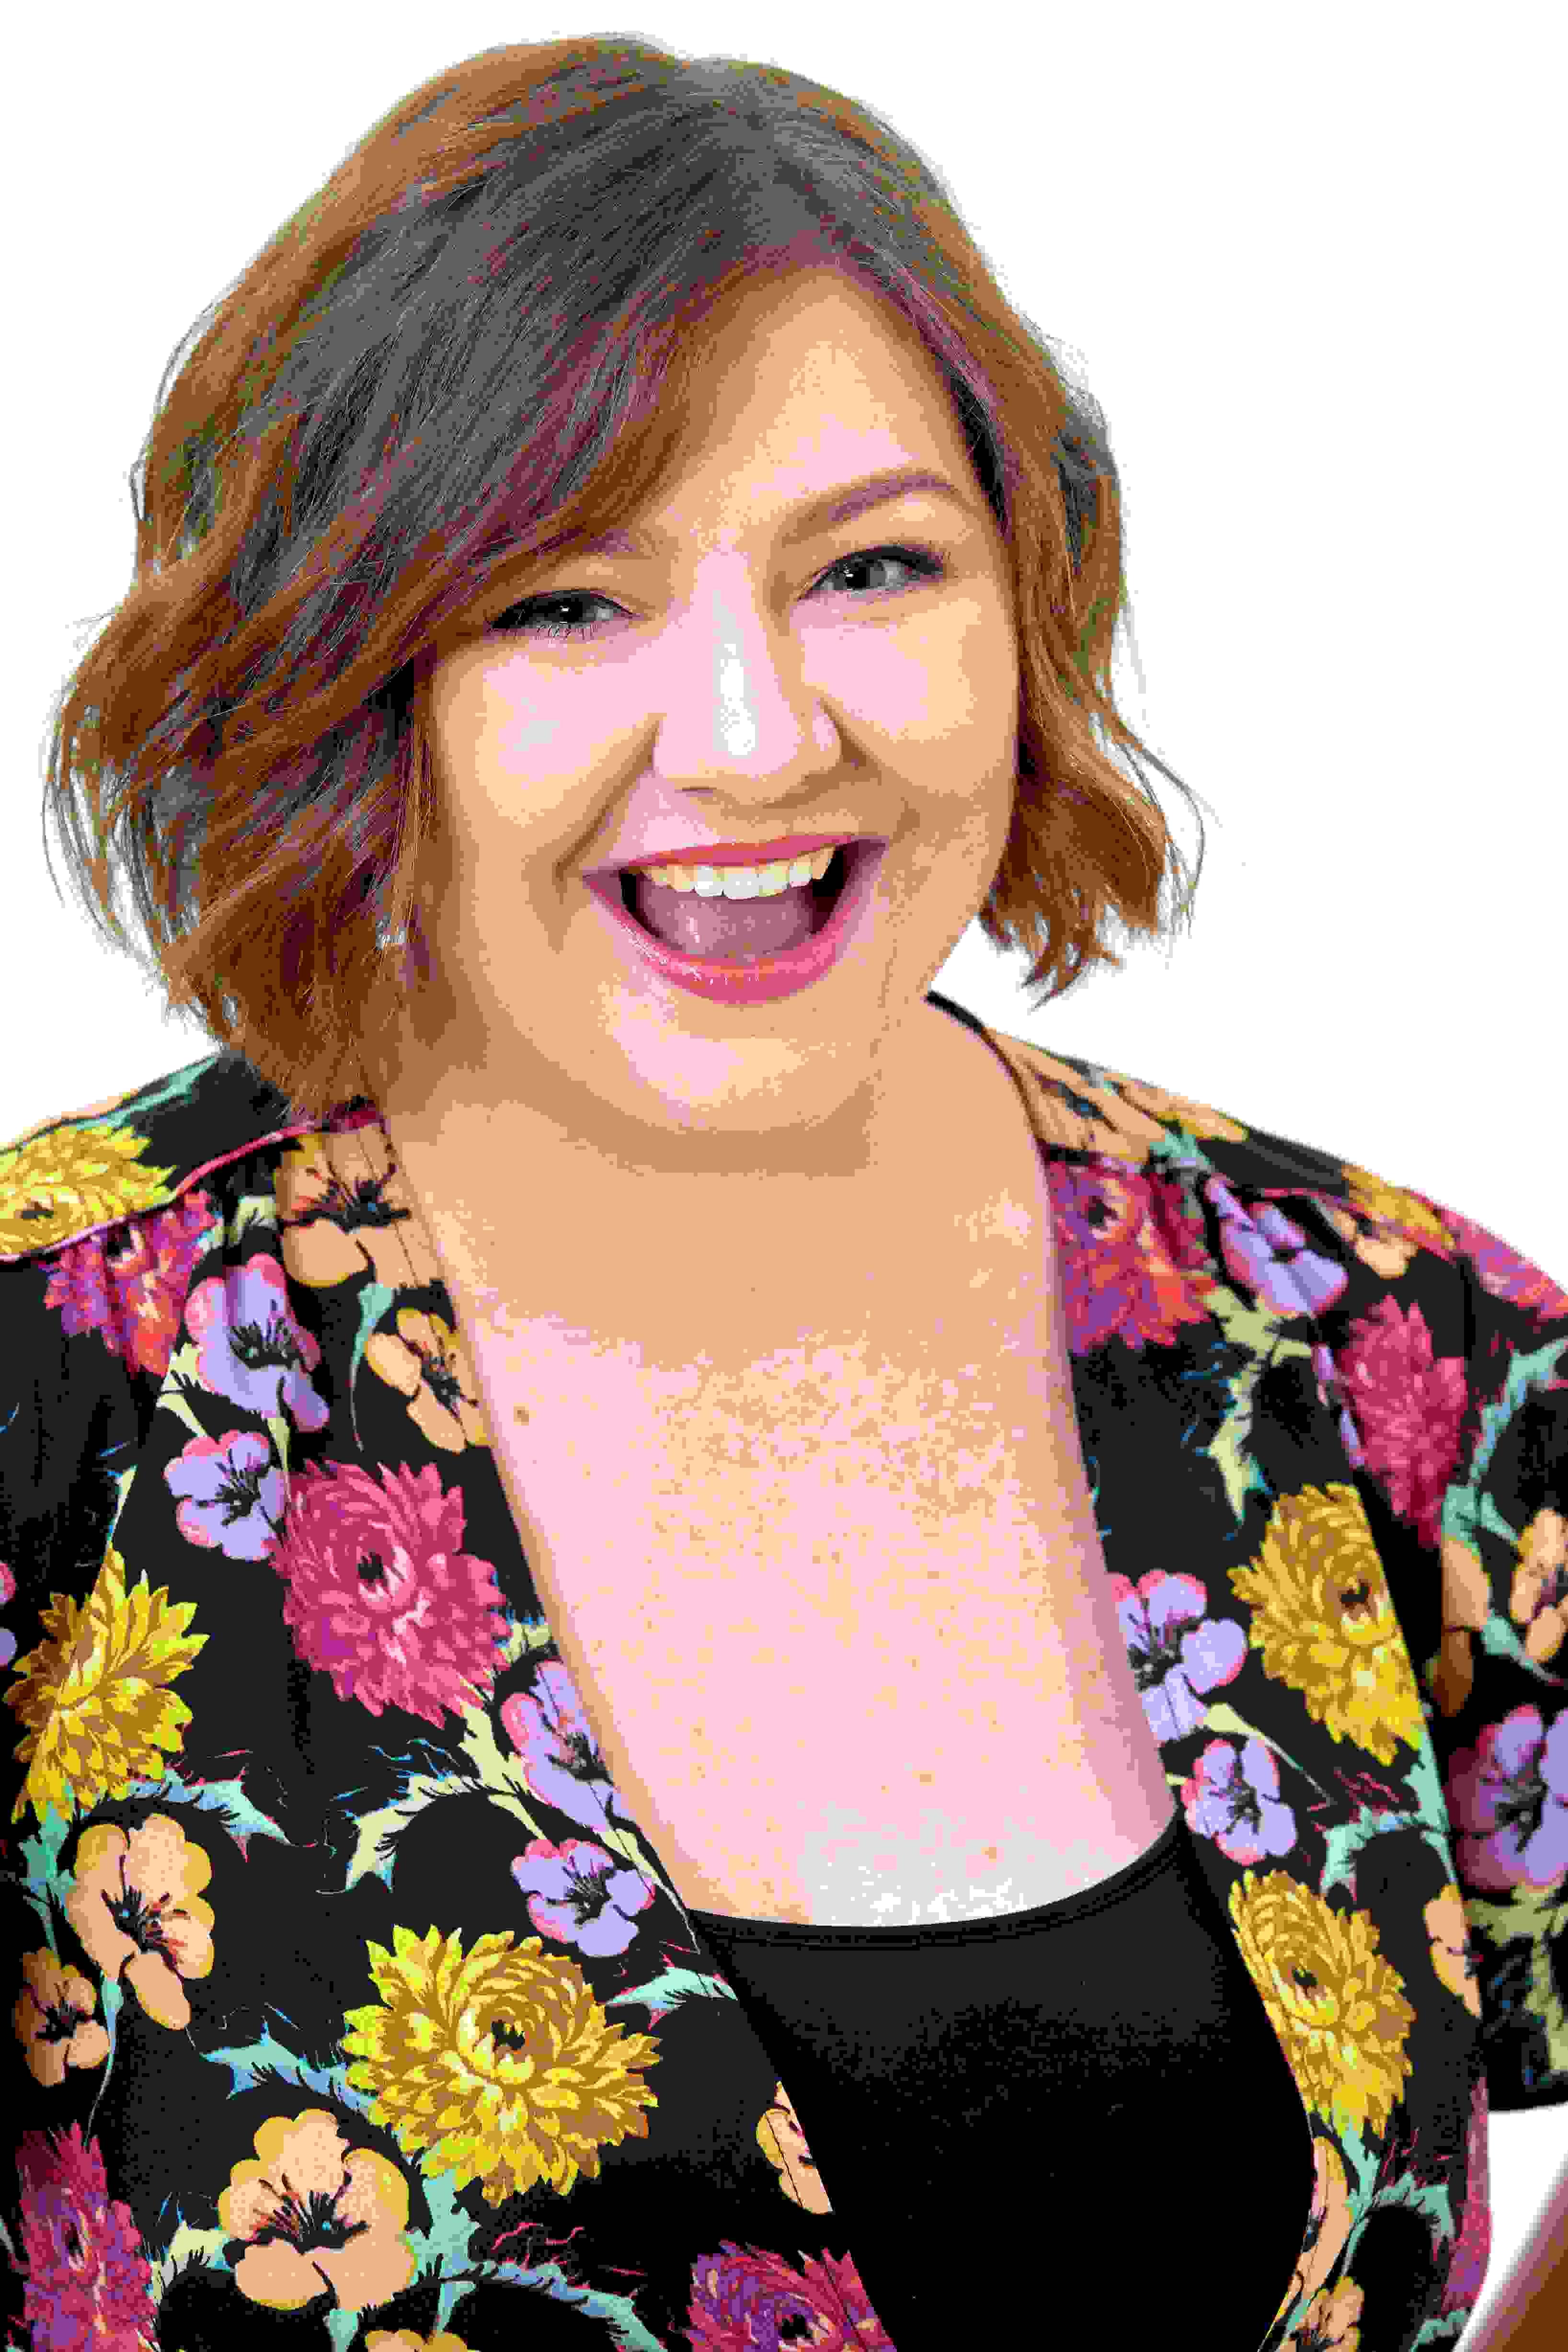 Jenna Guillaume